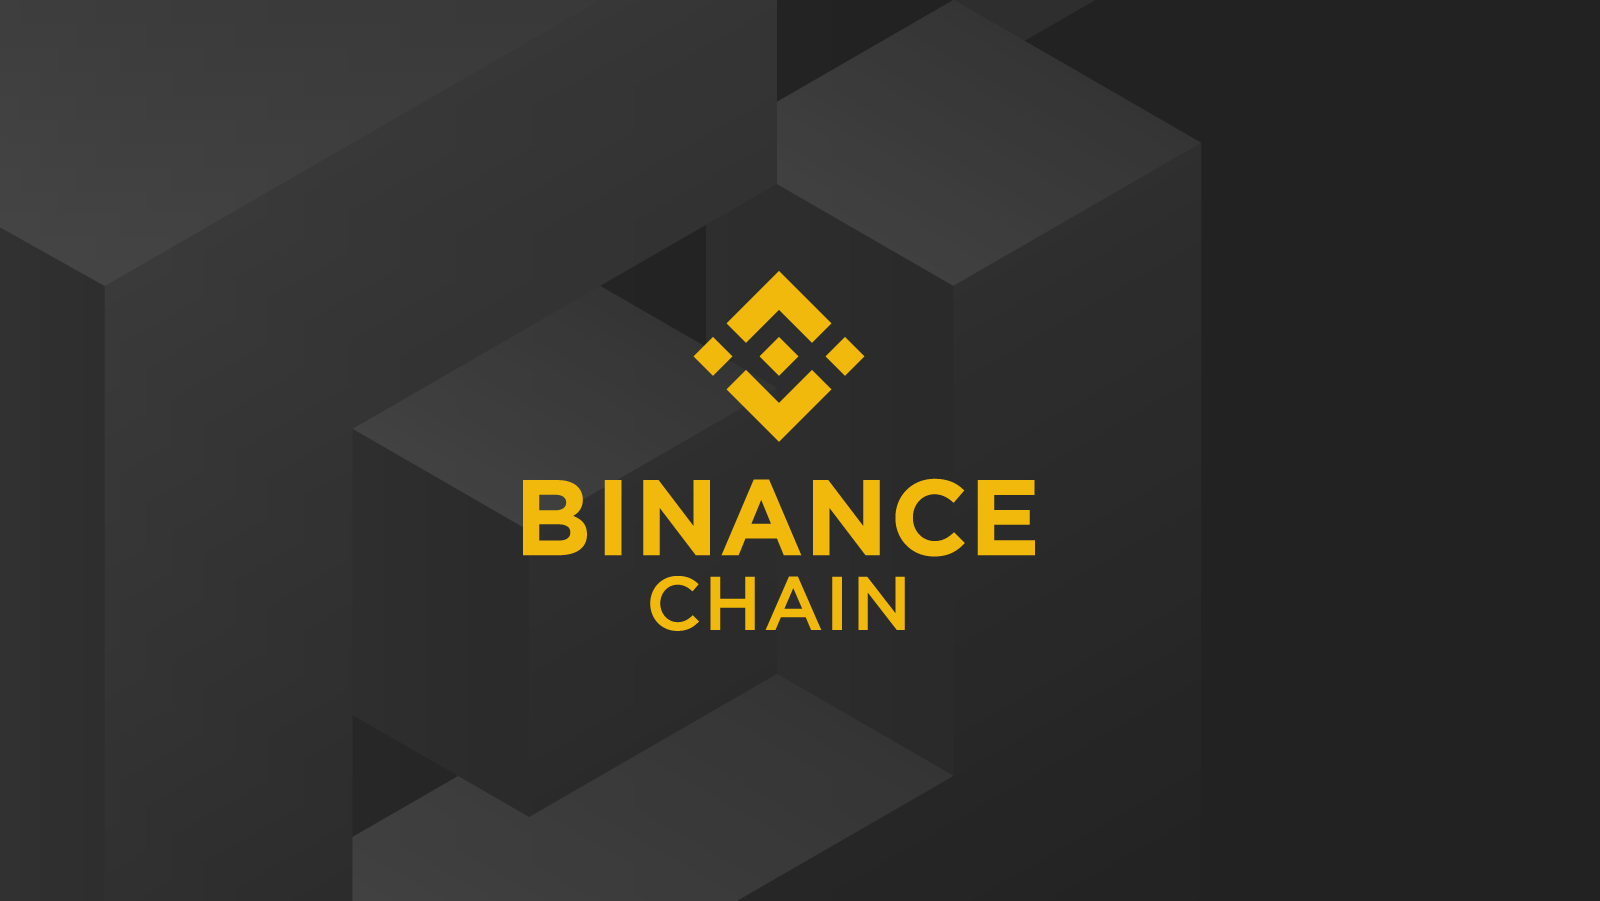 Binance presenta un token vinculado a Bitcoin emitido en su propia cadena de bloques